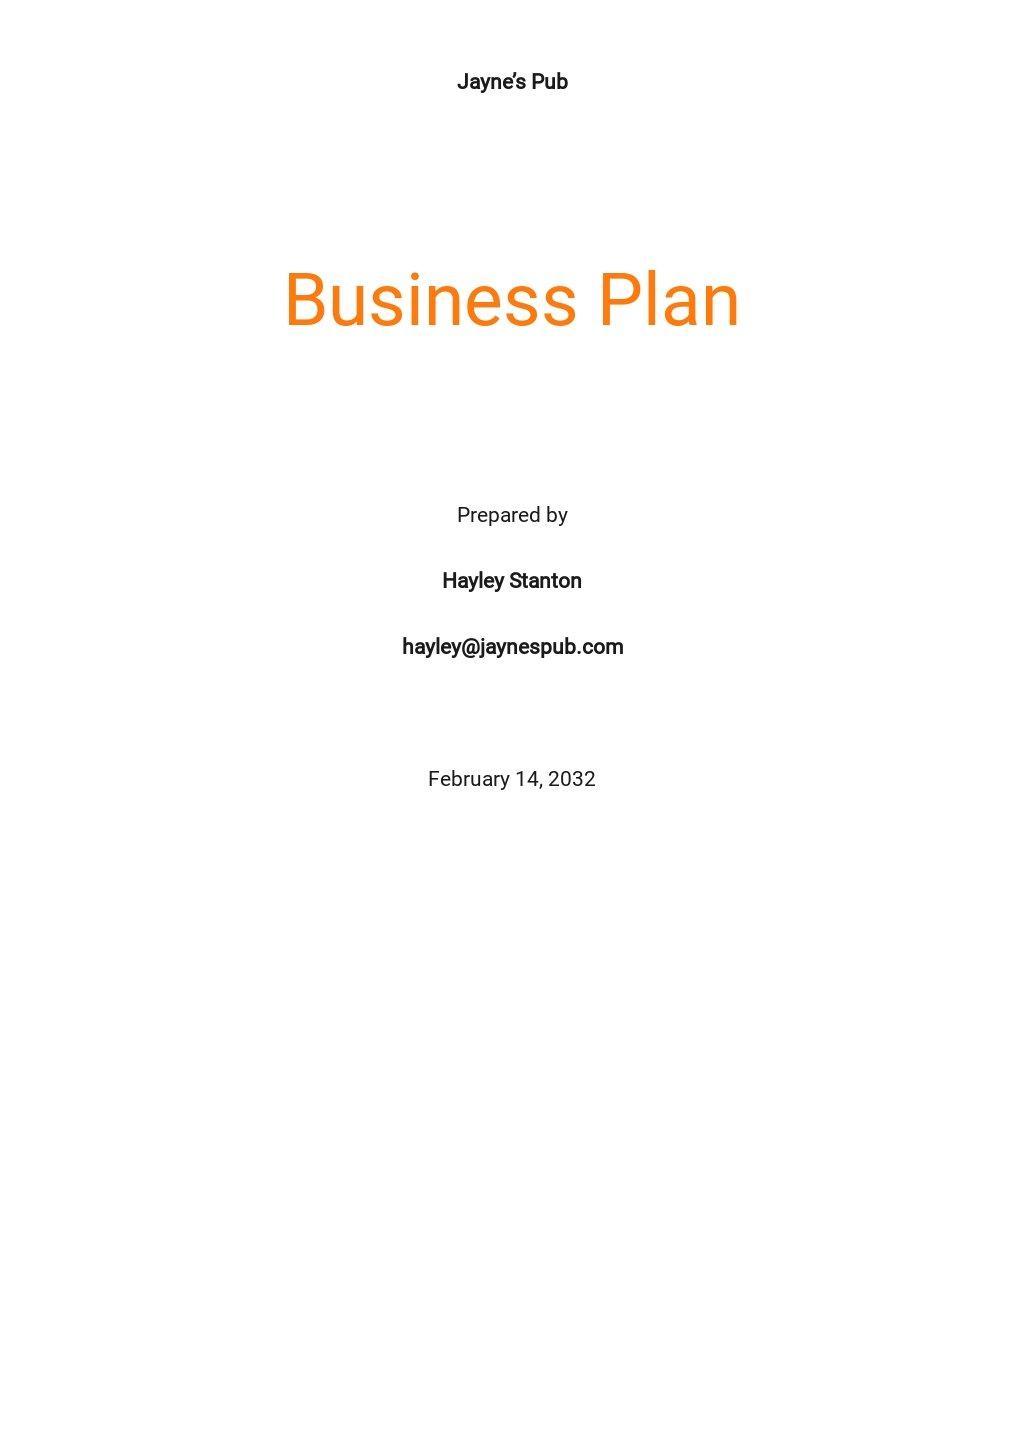 Pub Business Plan Template.jpe